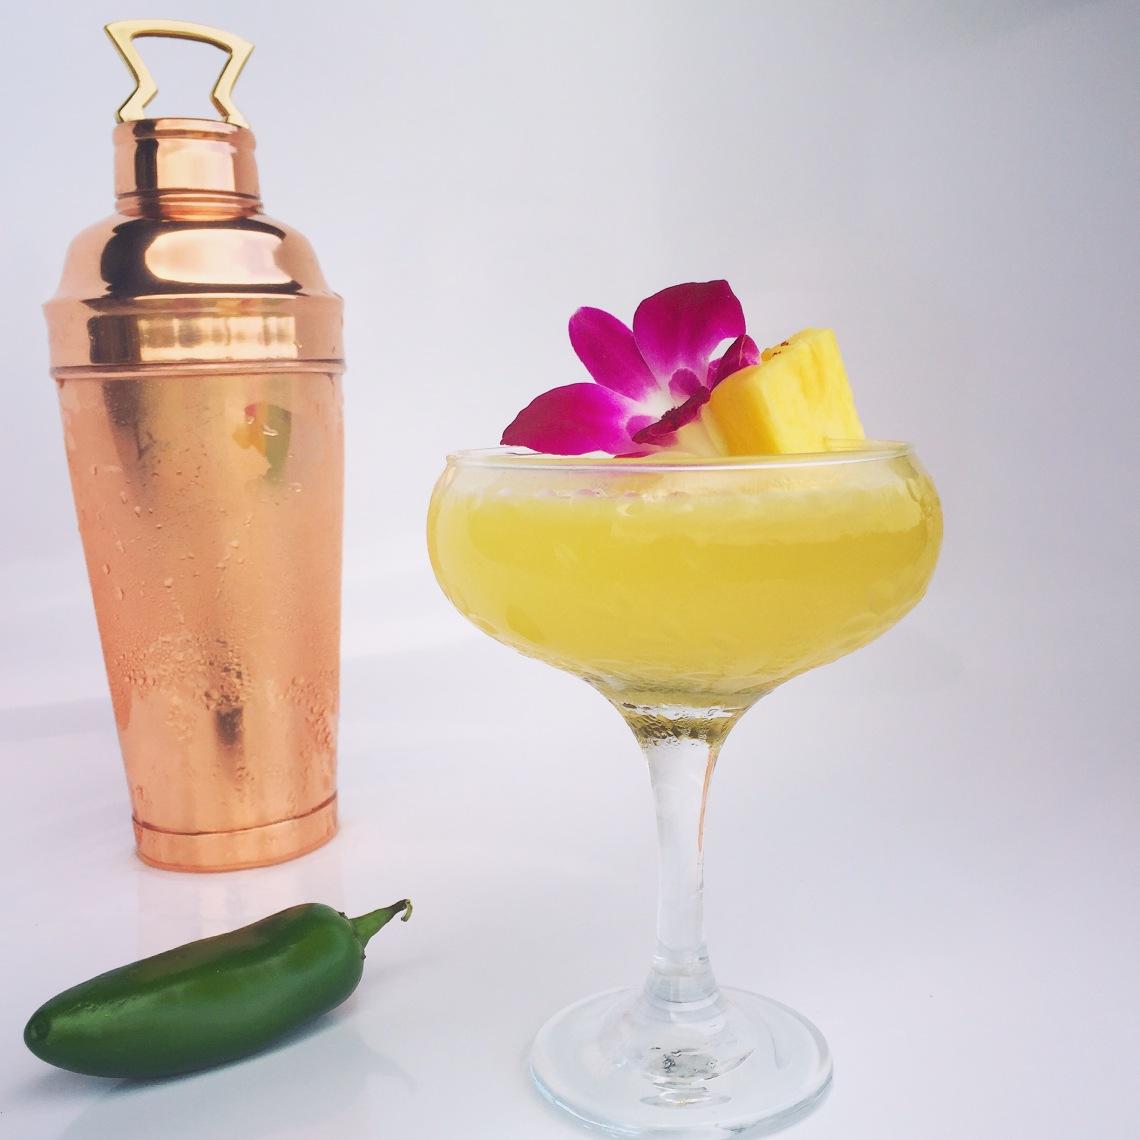 Pineapple Jalapeno Margarita